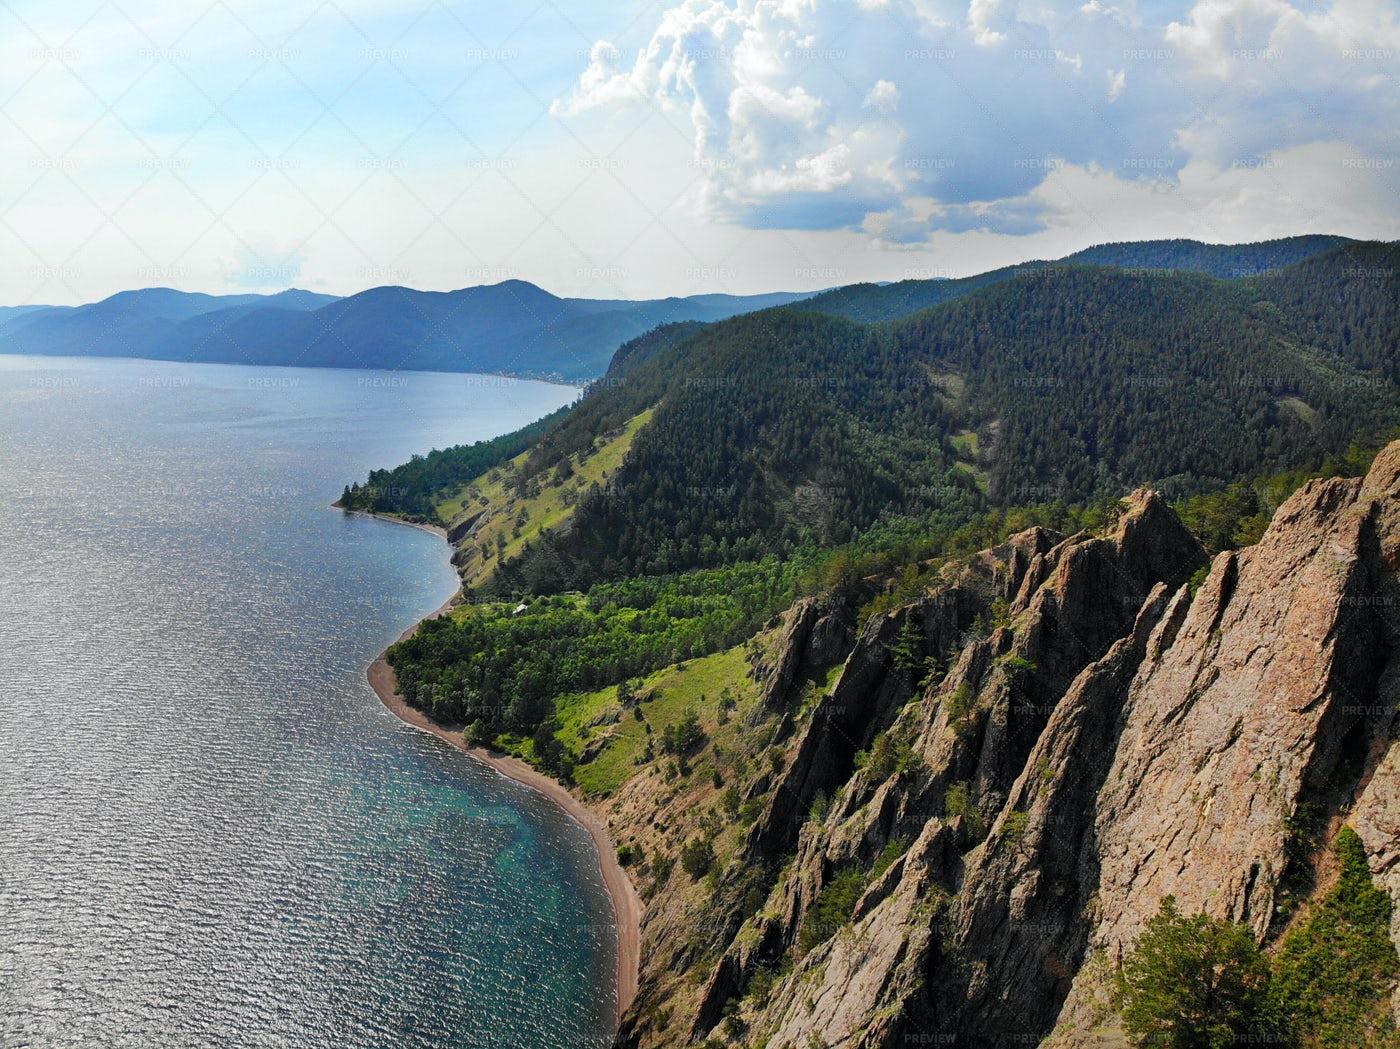 Lake Baikal And Skriper Rock Aerial: Stock Photos